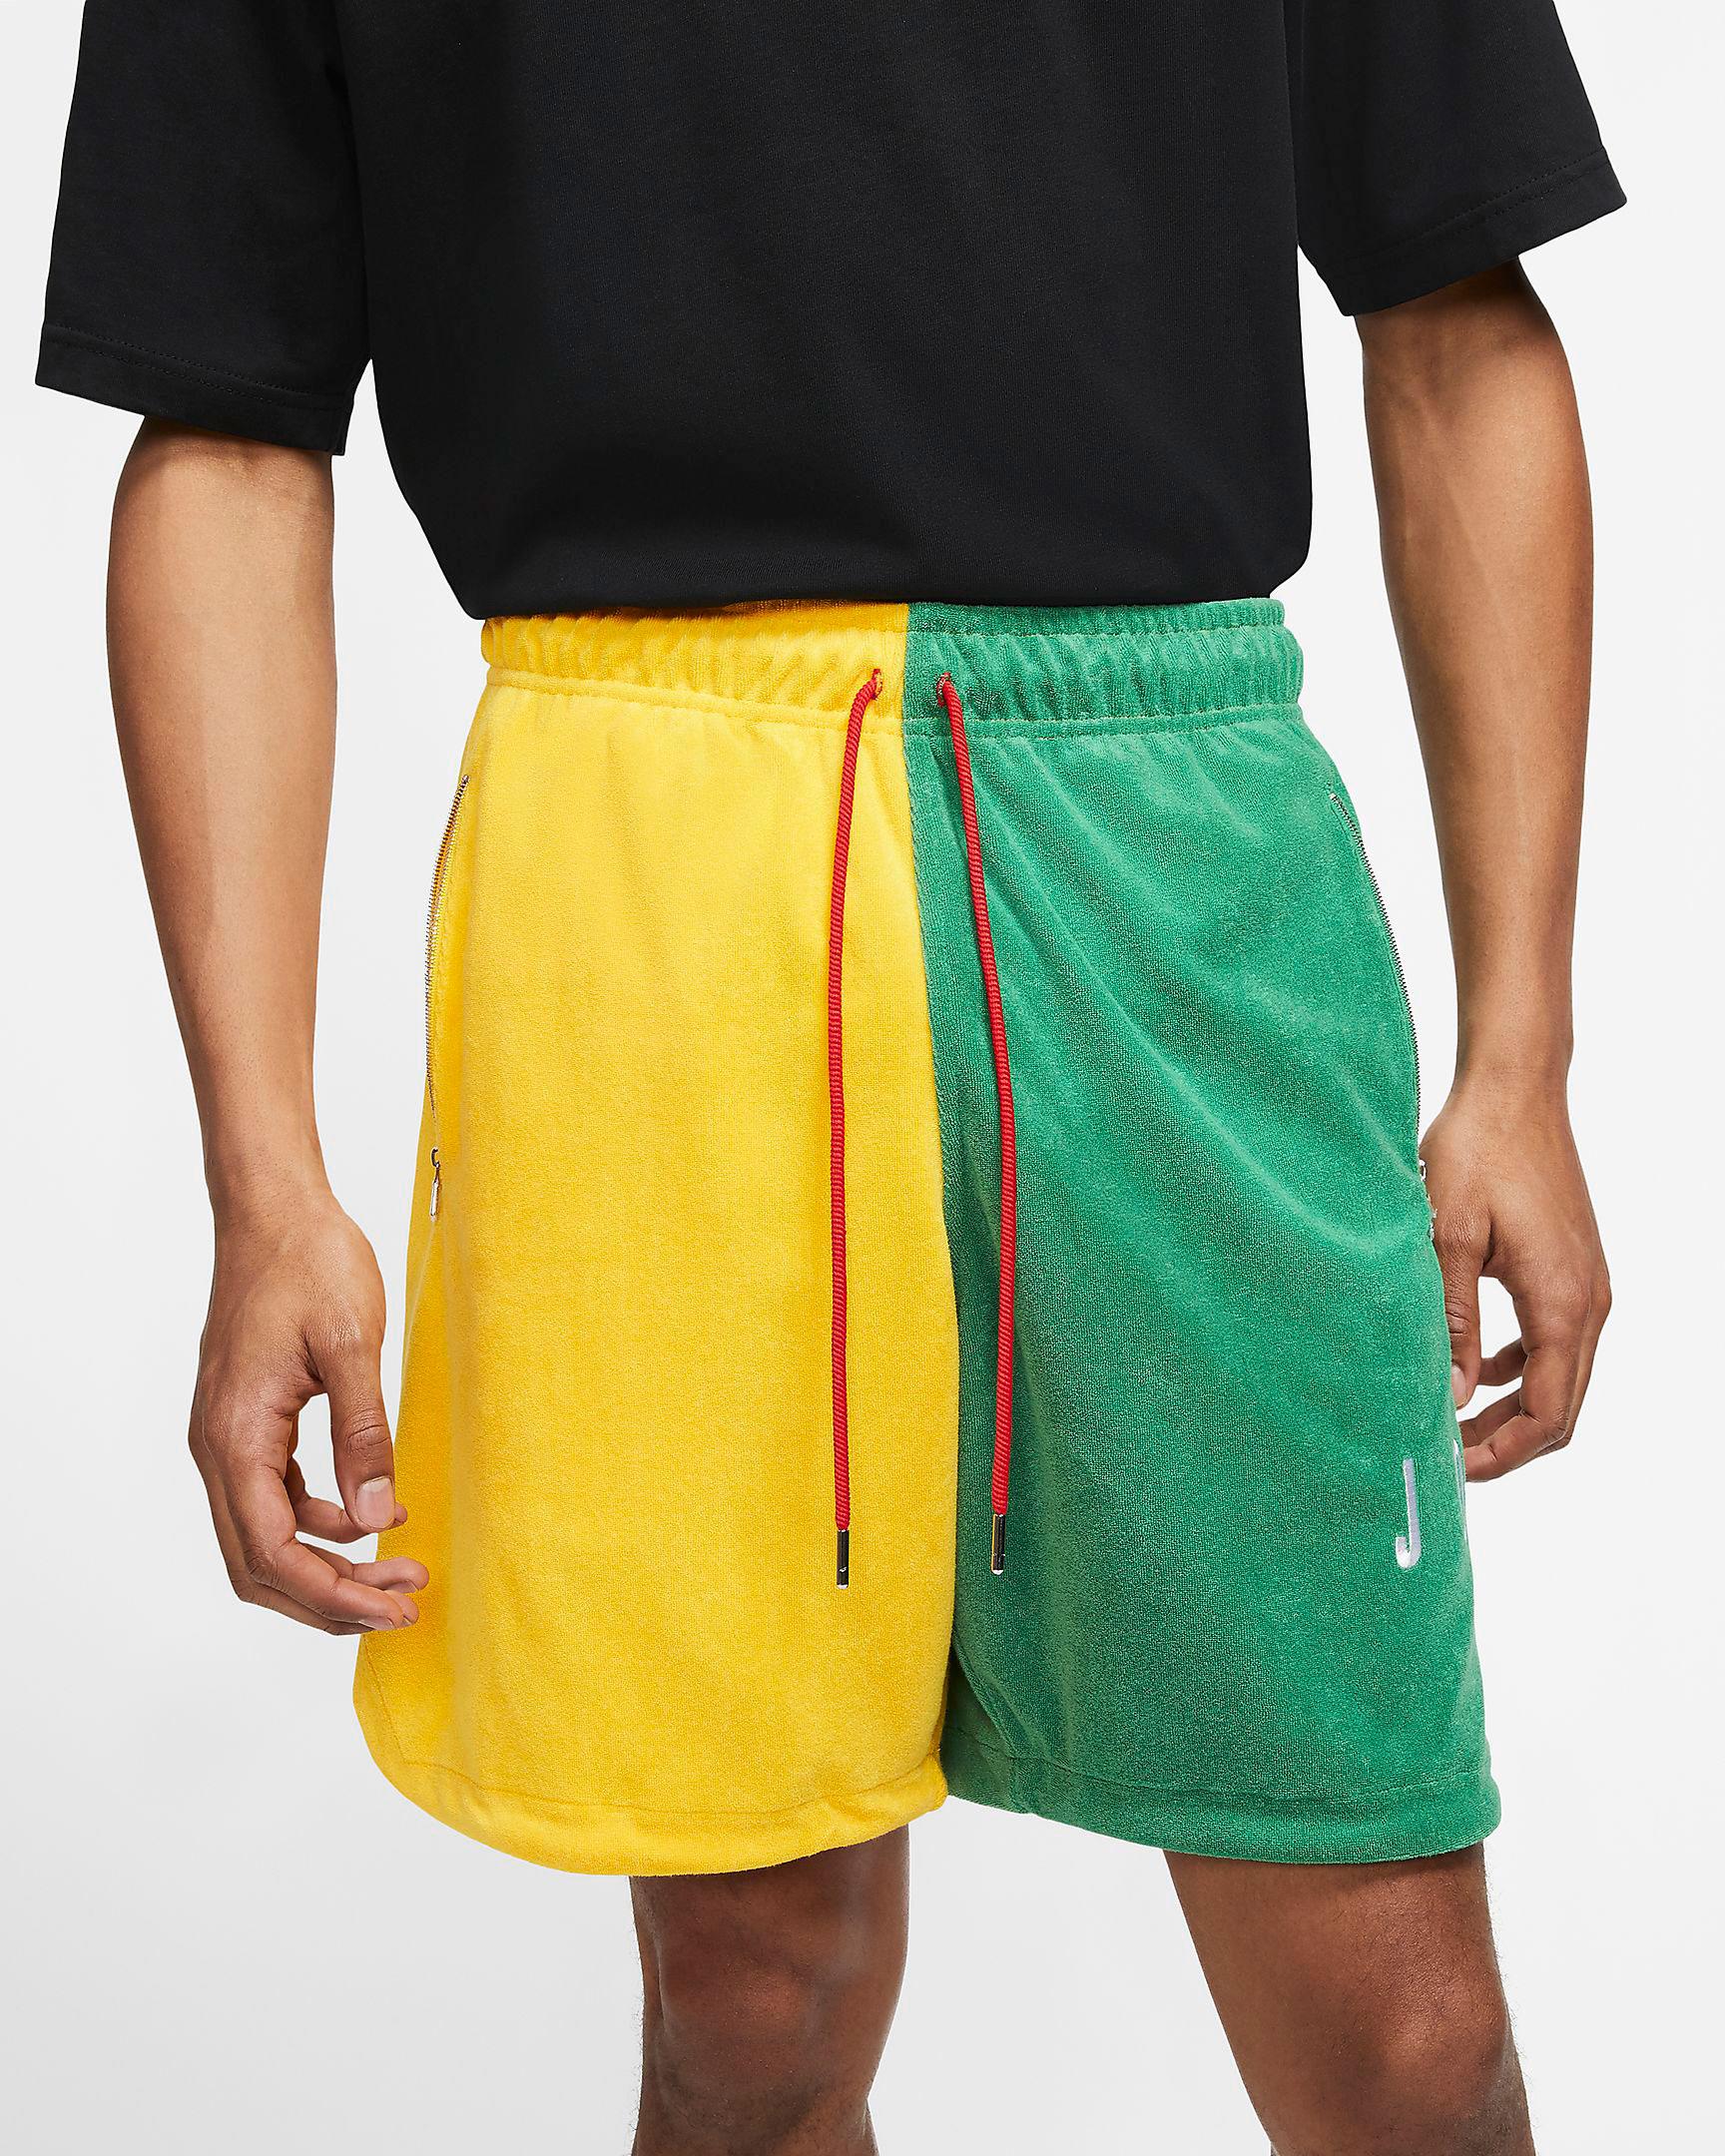 air-jordan-4-green-metallic-shorts-match-1